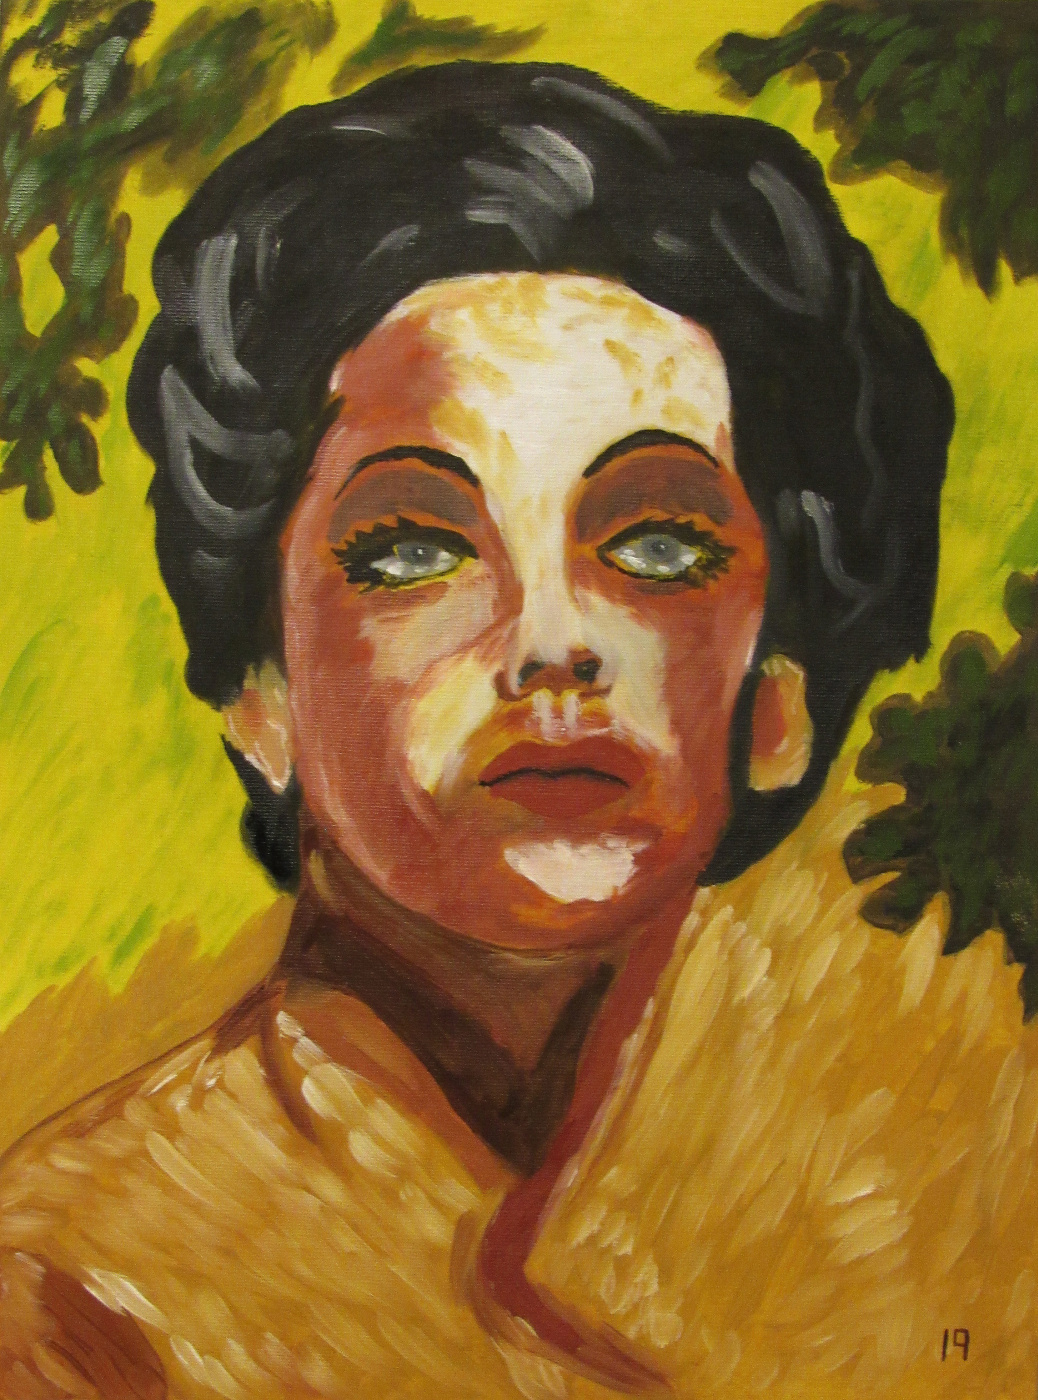 Artashes Vladimirovich Badalyan. Picabia Portrait of Dorothy B. (copy) - x-map. - 40x30